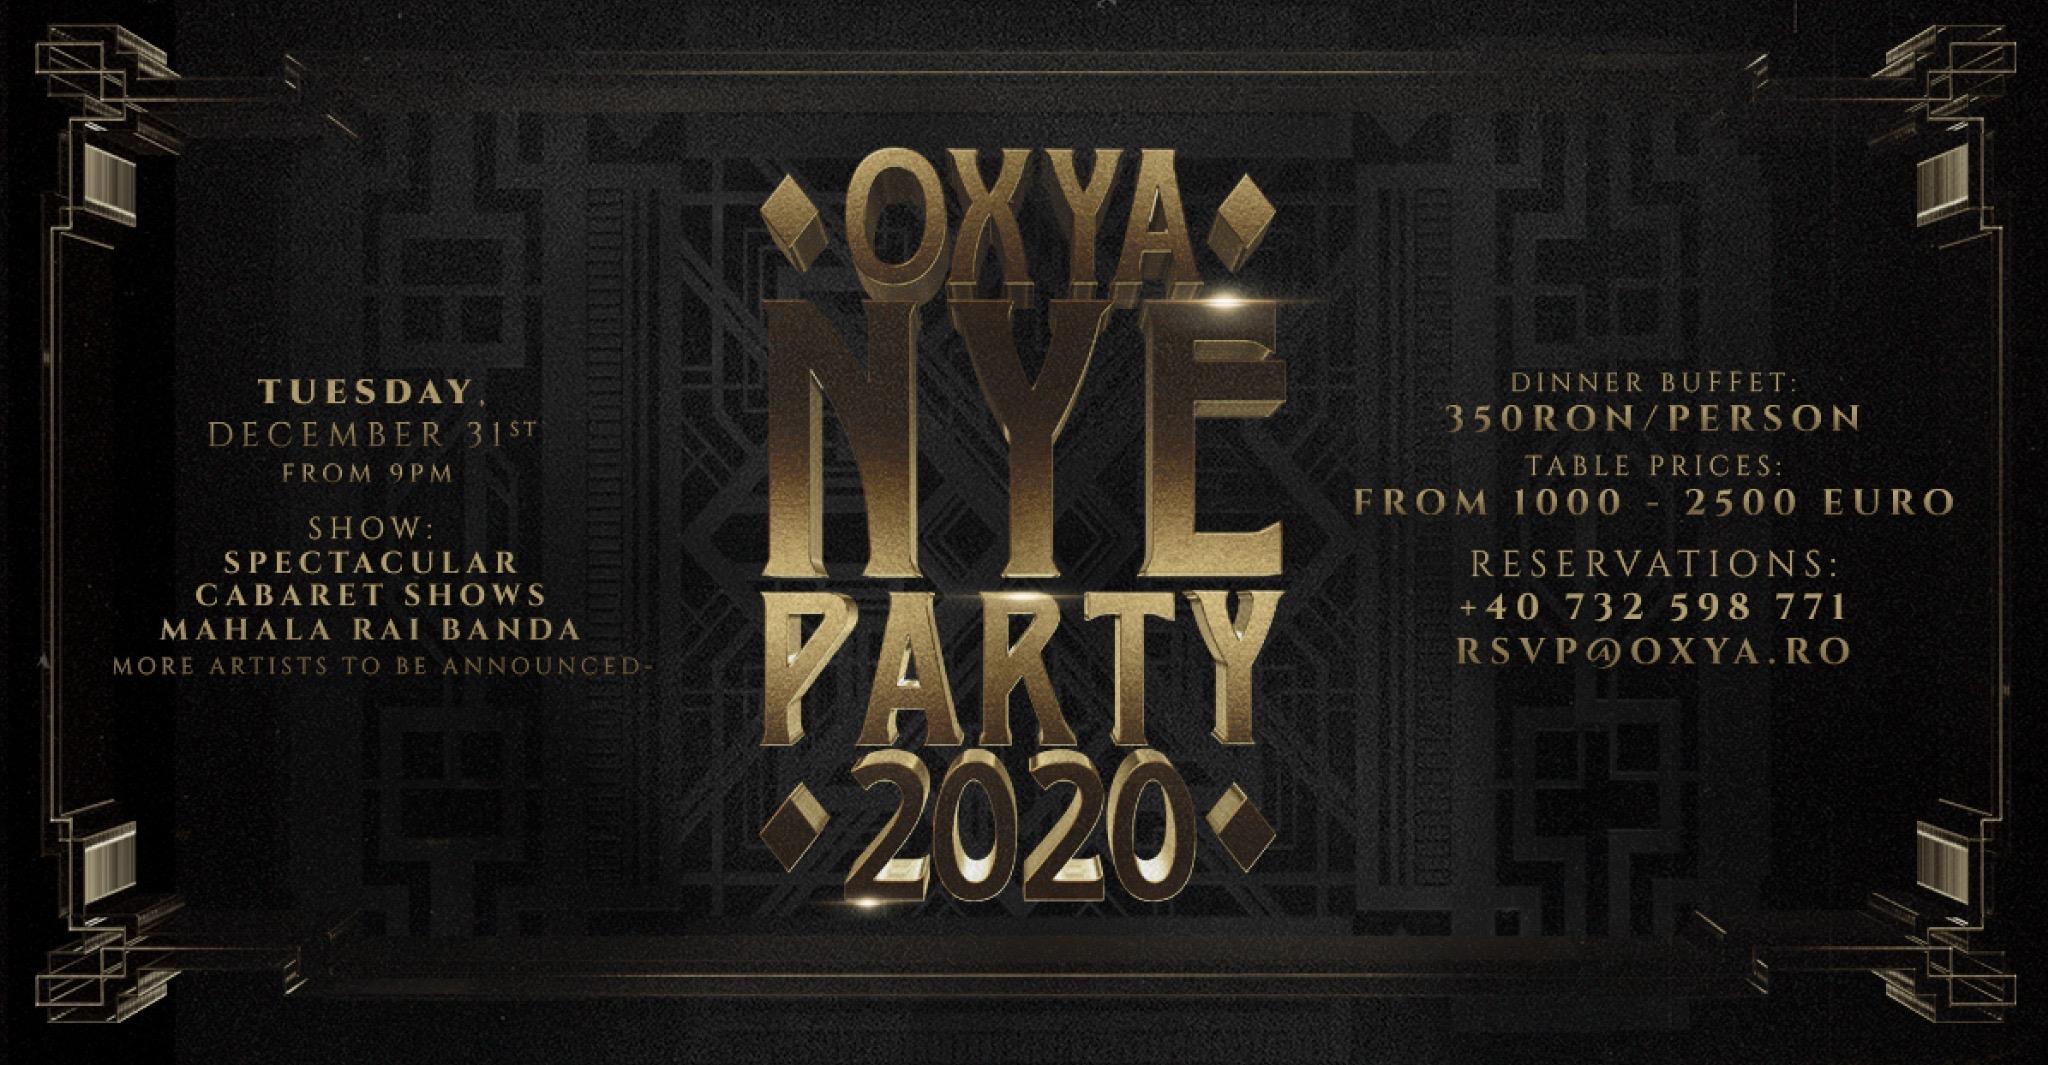 new_year_eve_oxya_club_bucharest_2020